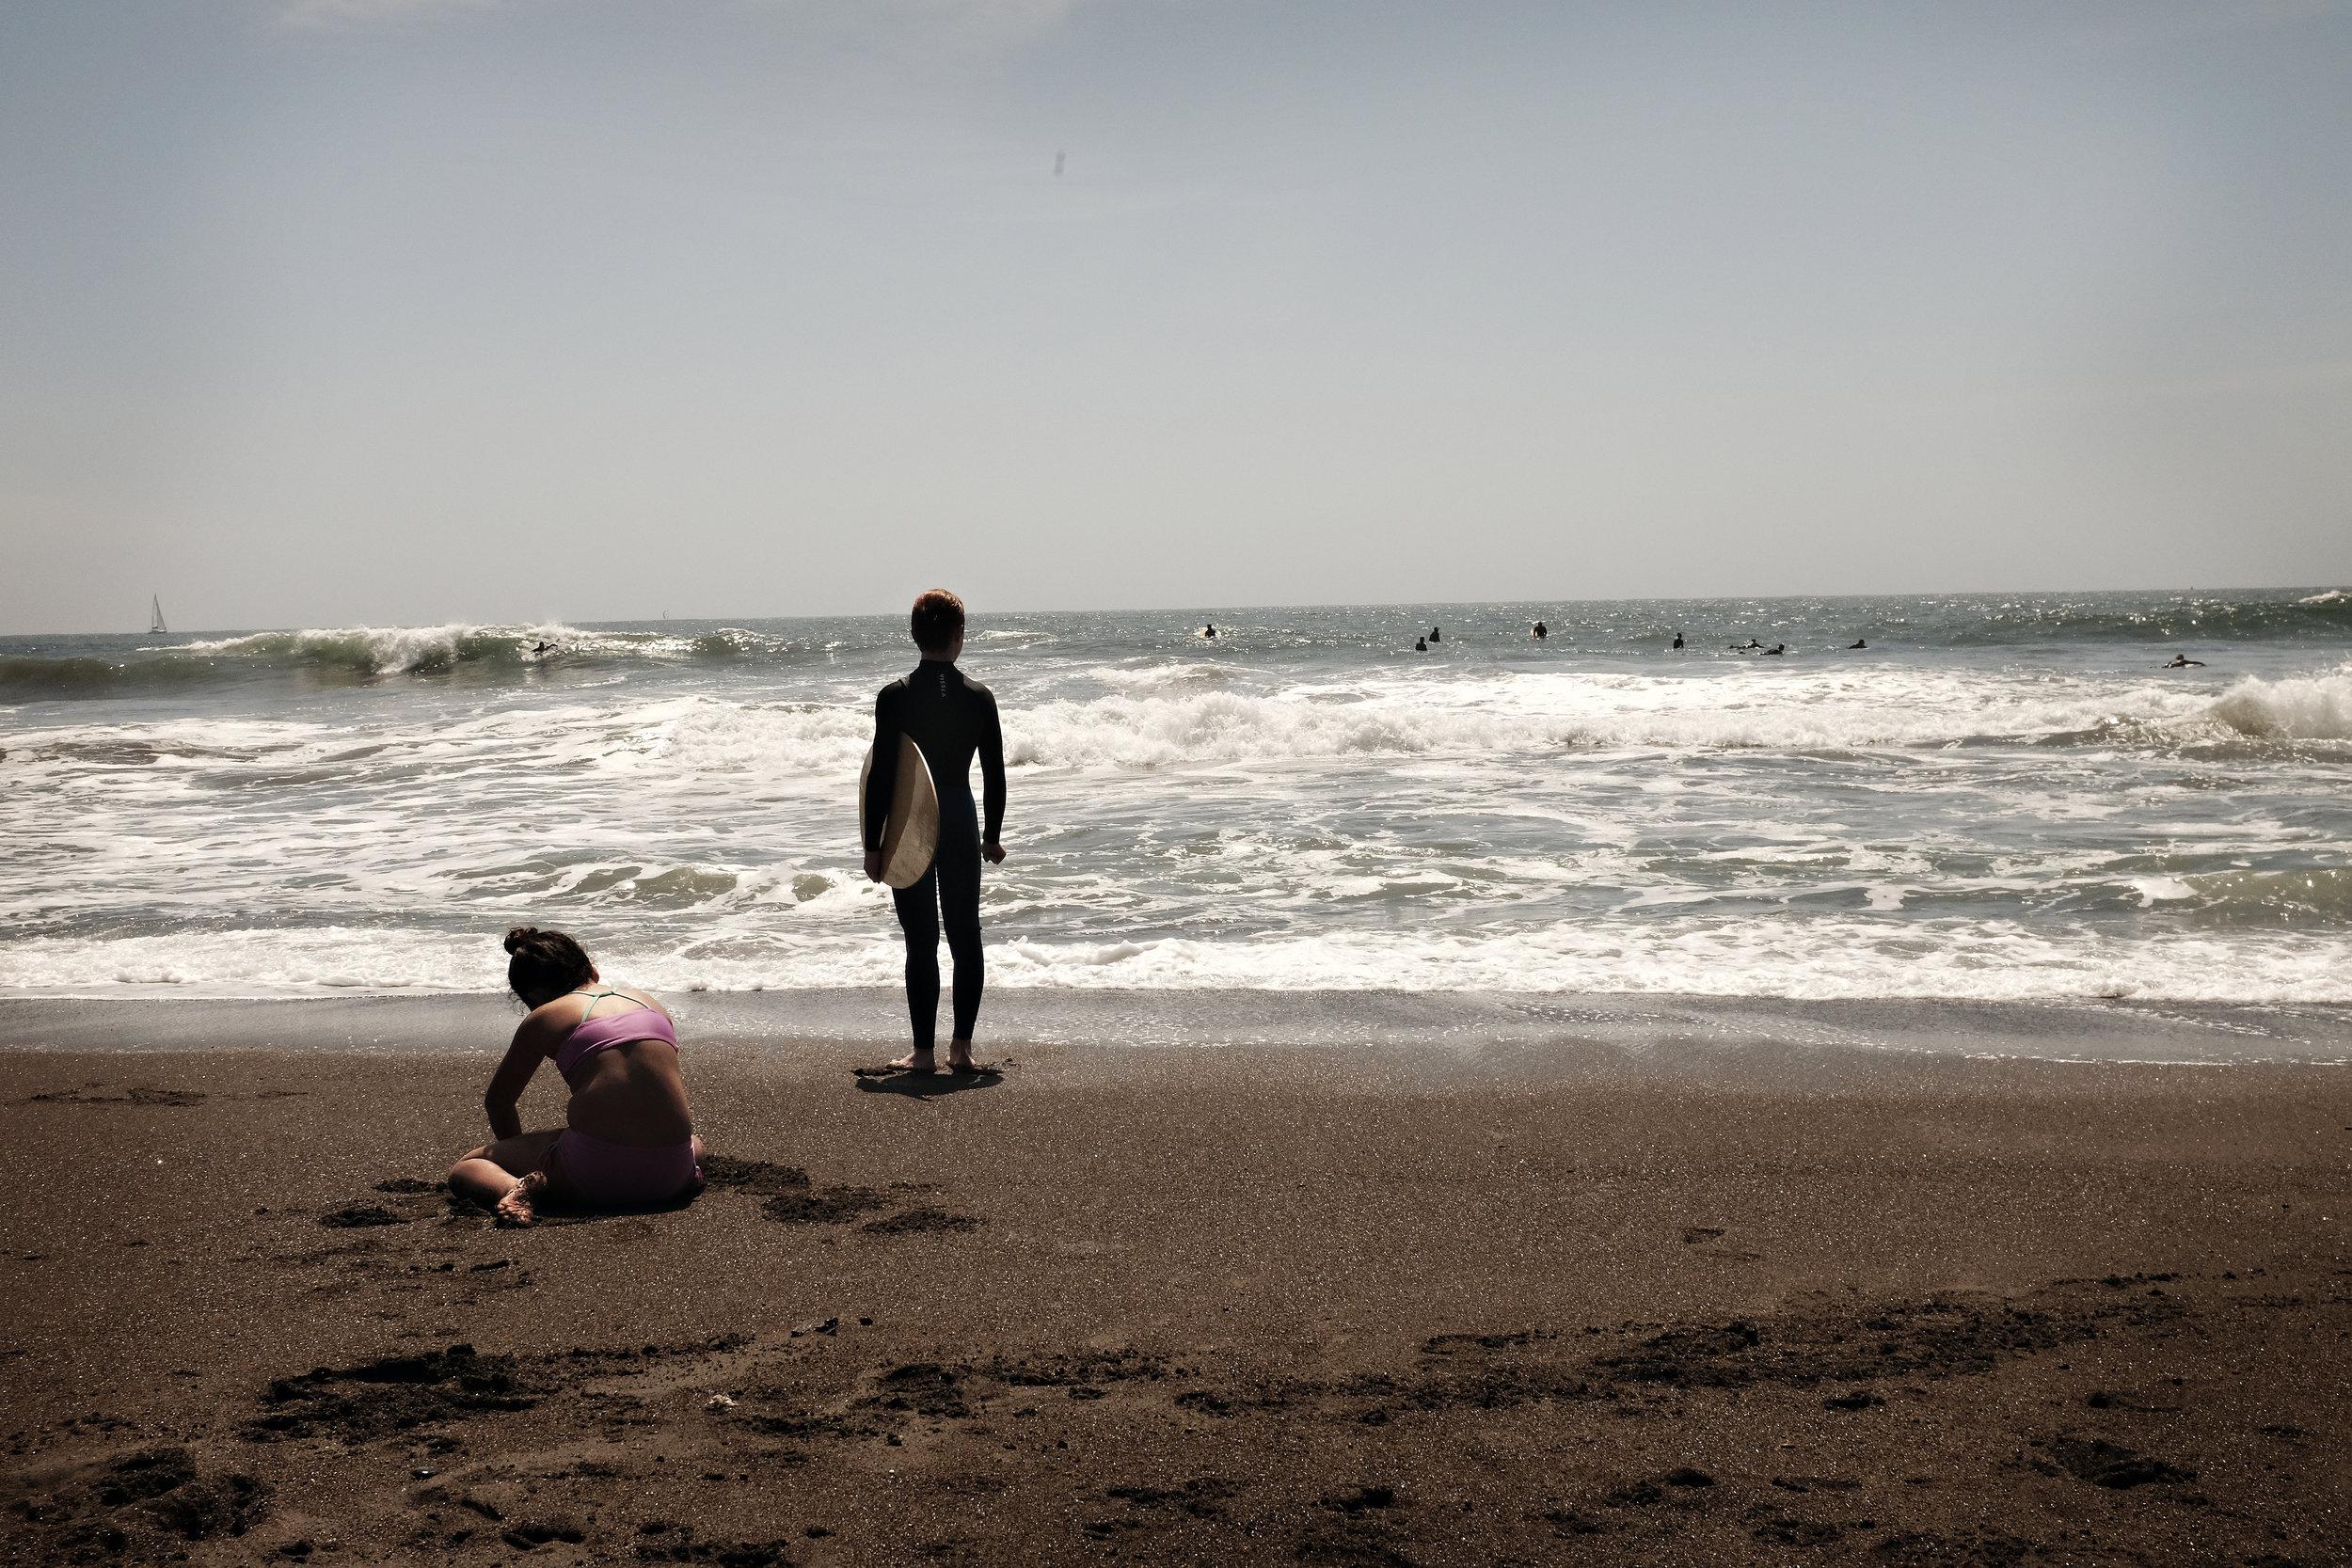 sailboata_surfer-1.jpg